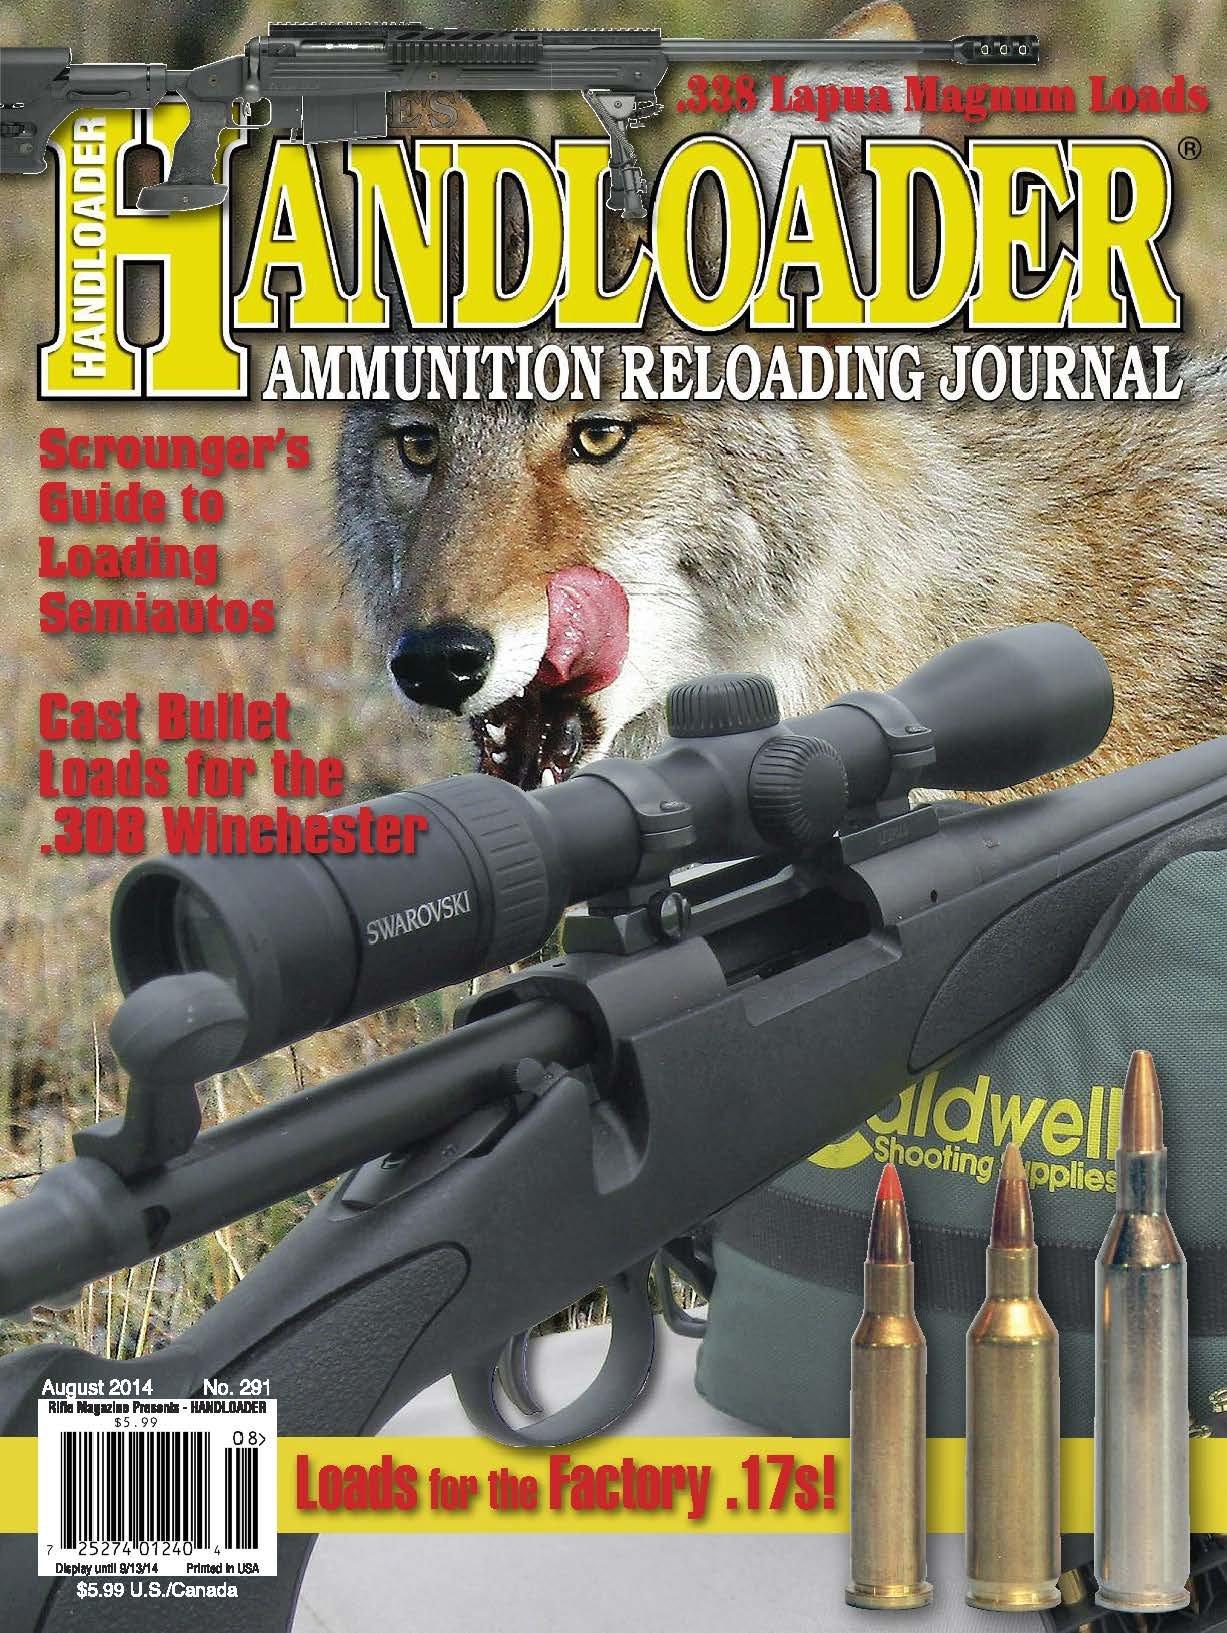 Handloader Magazine - August 2014 - Issue number 291: Dave